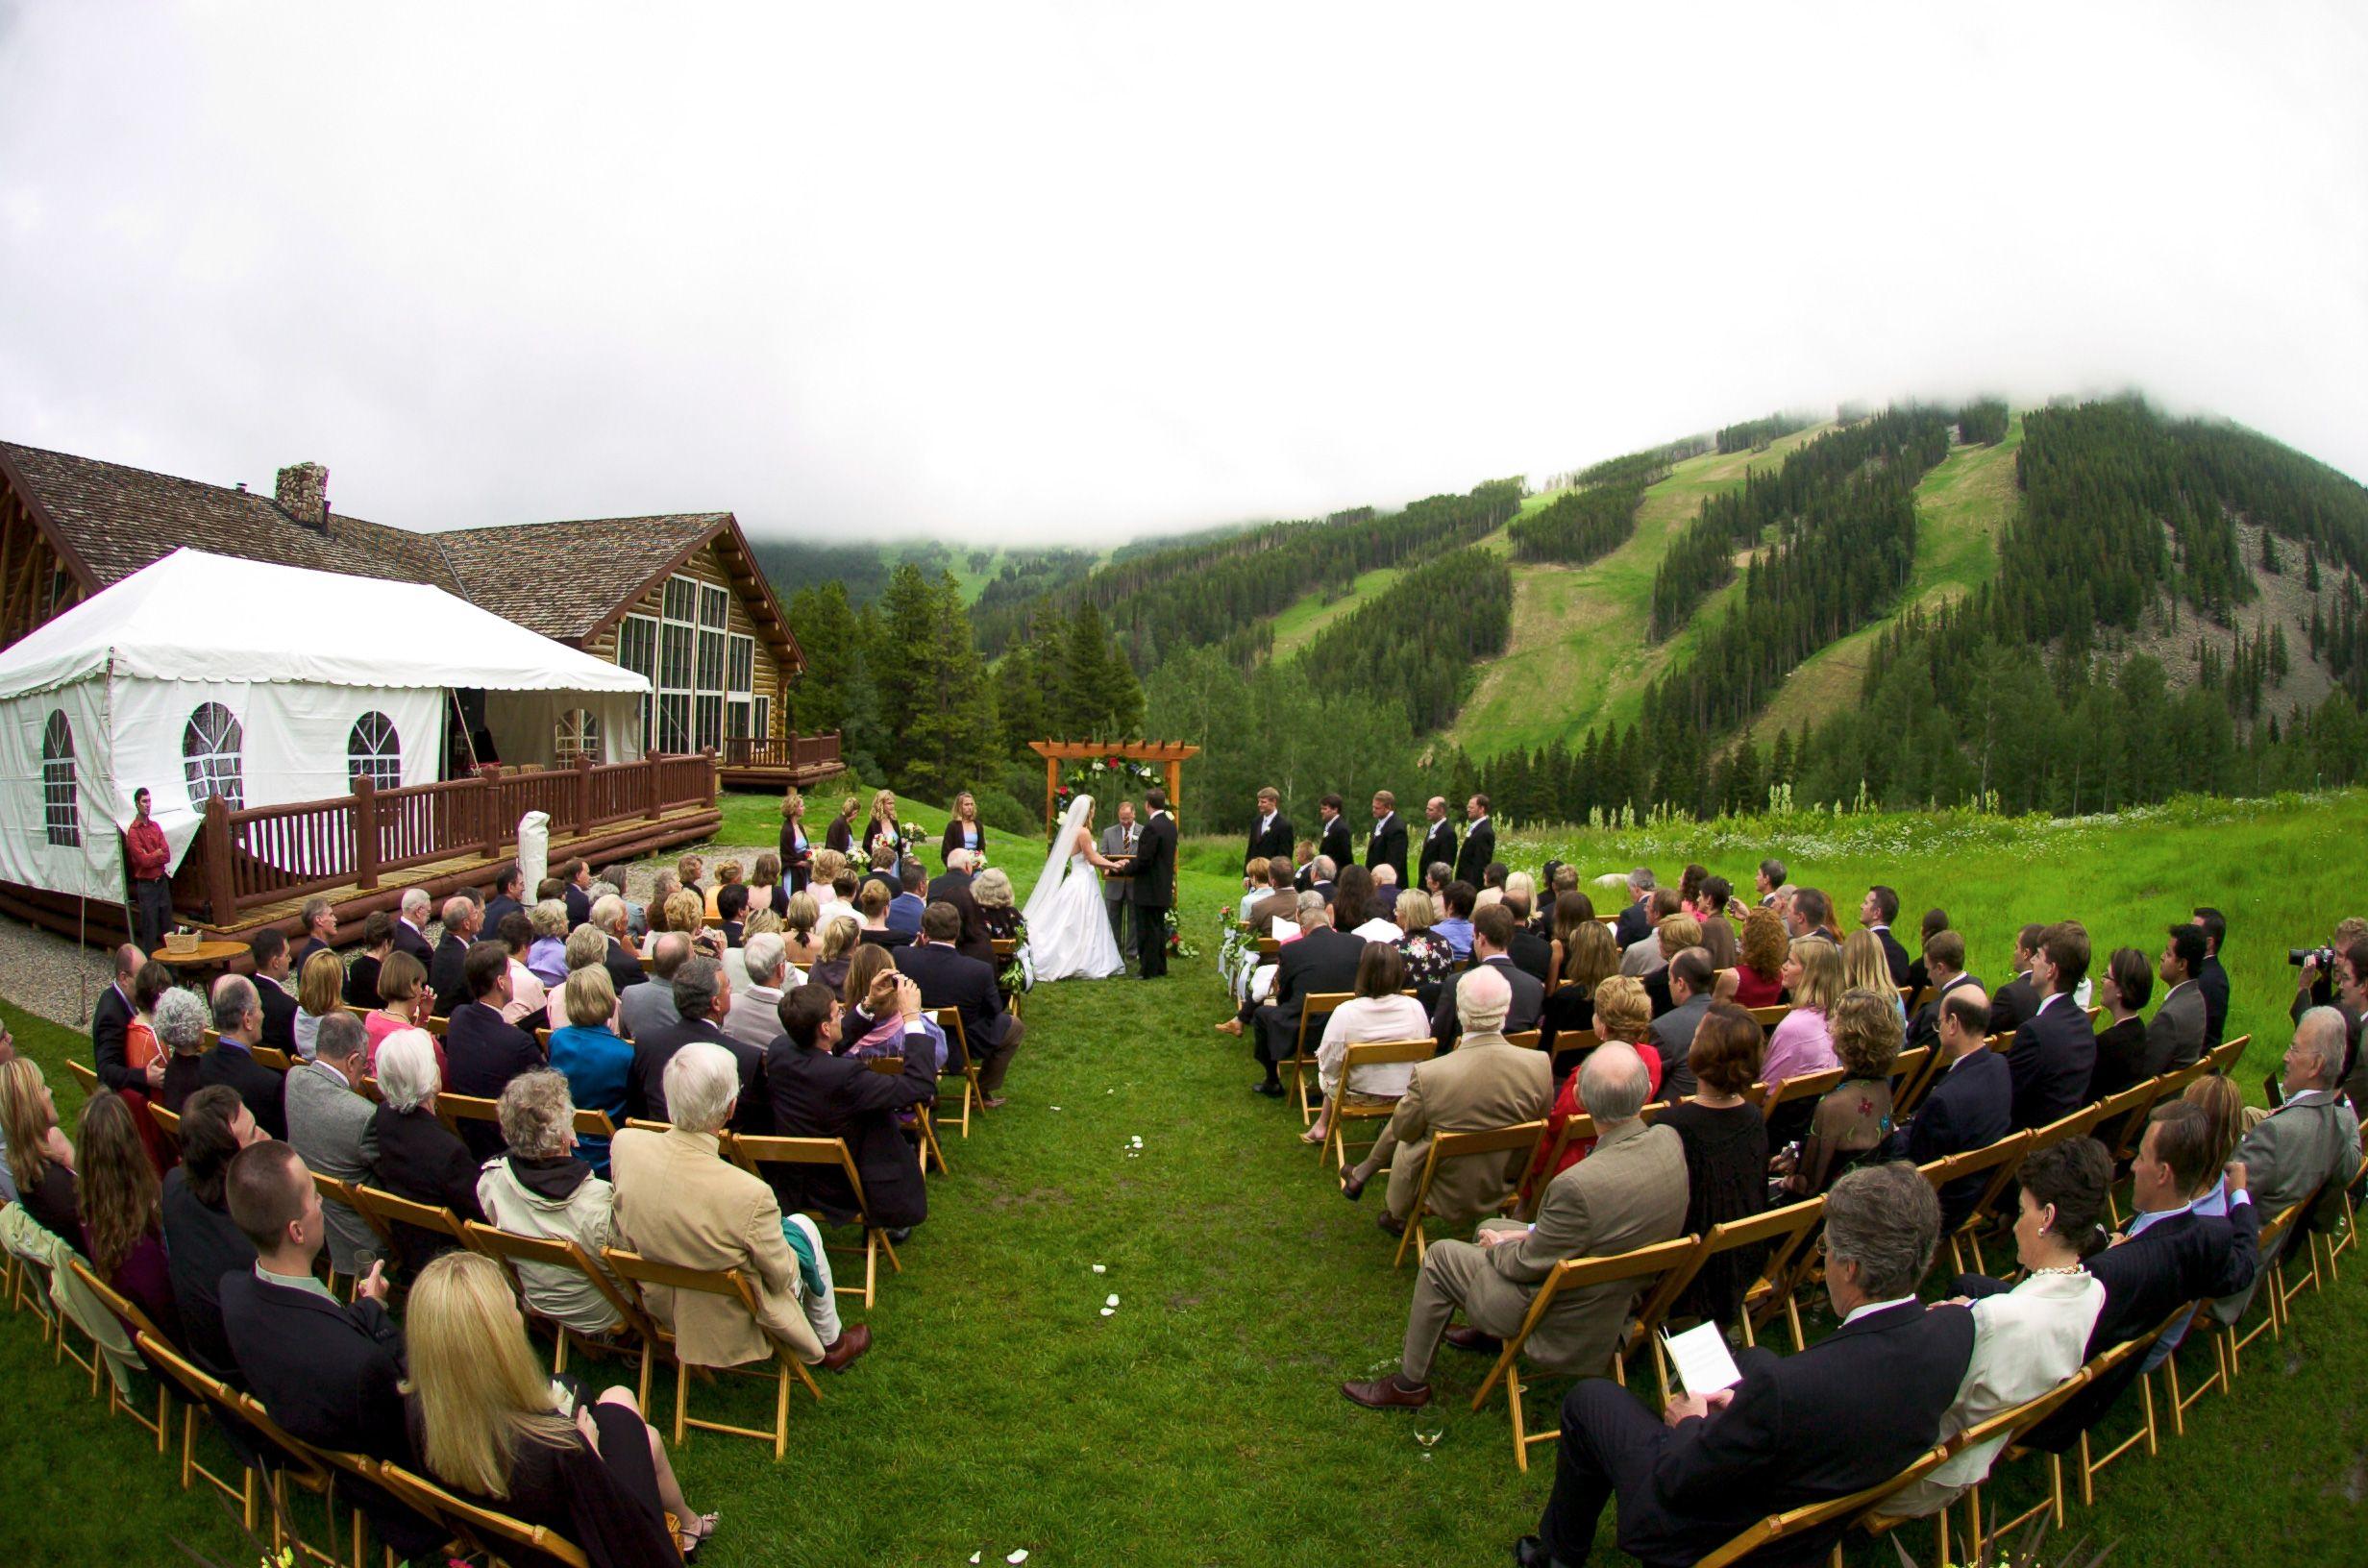 Beaver Creek Wedding Beanos Cabin Wedding Gorgeous Day For A Wedding  Ceremony At Beanou0027s Cabin,